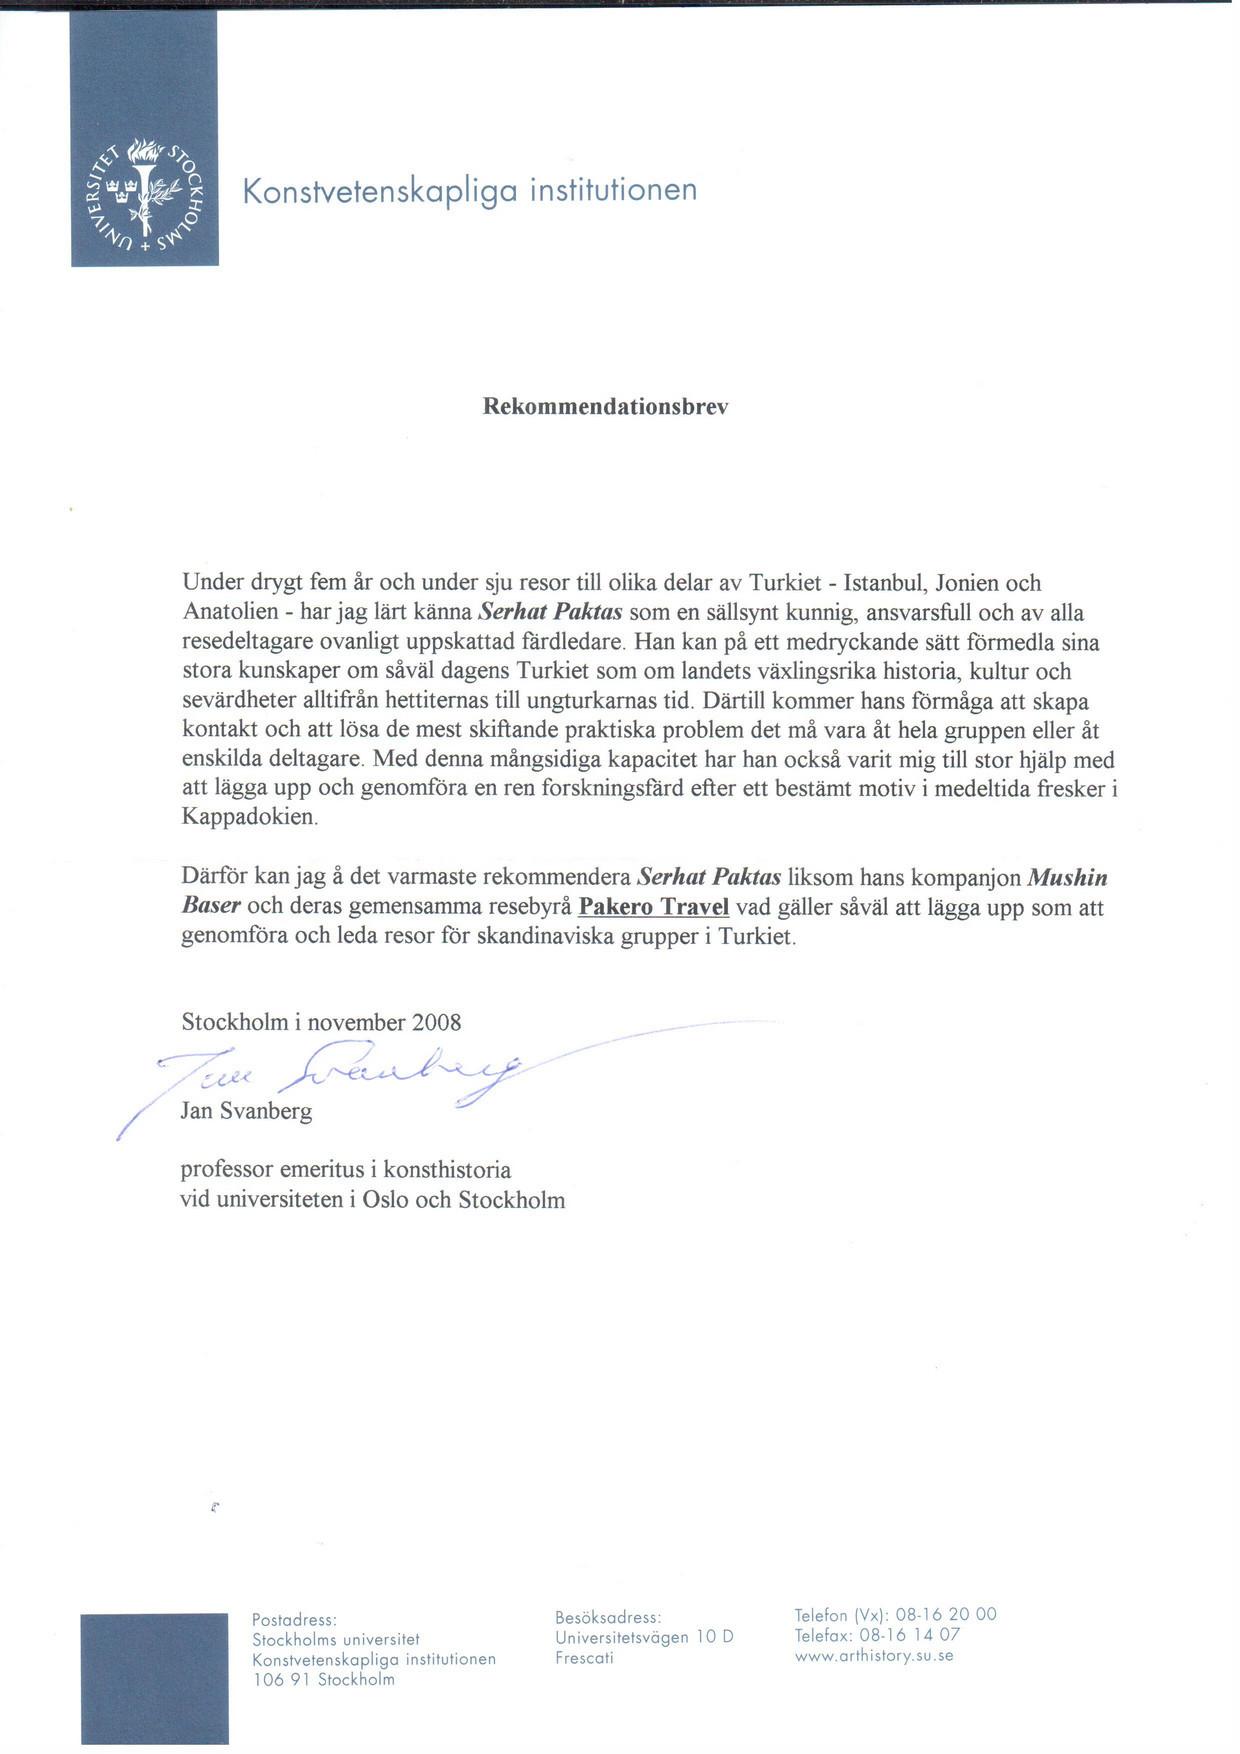 STOCKHOLMS UNIVERSITET - PROF. JAN SVANBERG